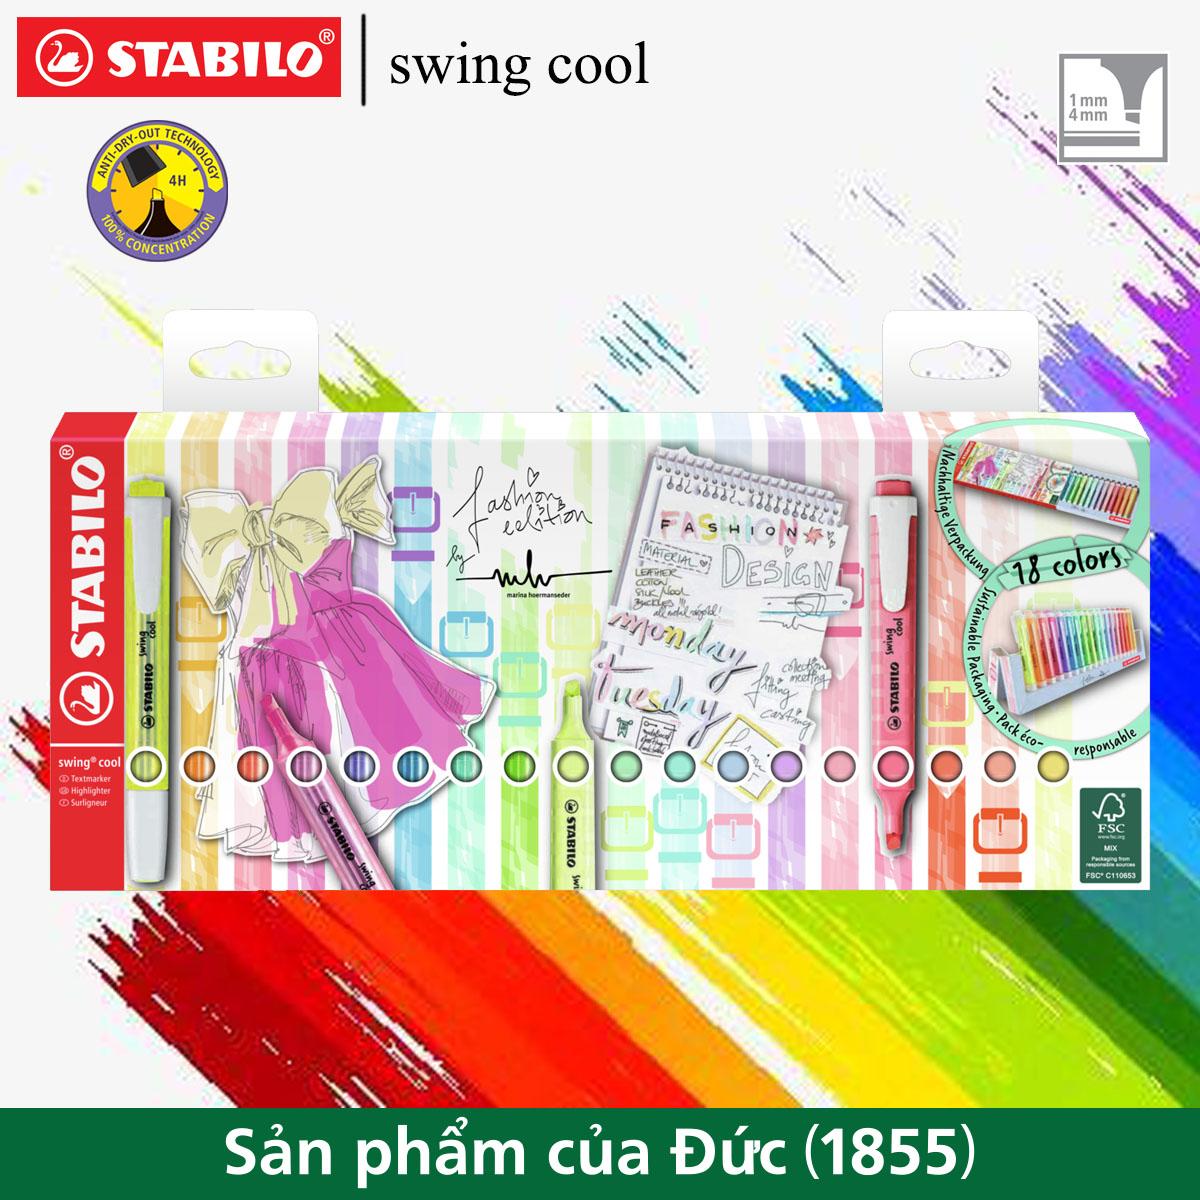 Hộp 18 bút dạ quang STABILO swing cool/ swing cool Pastel (HL27518P)